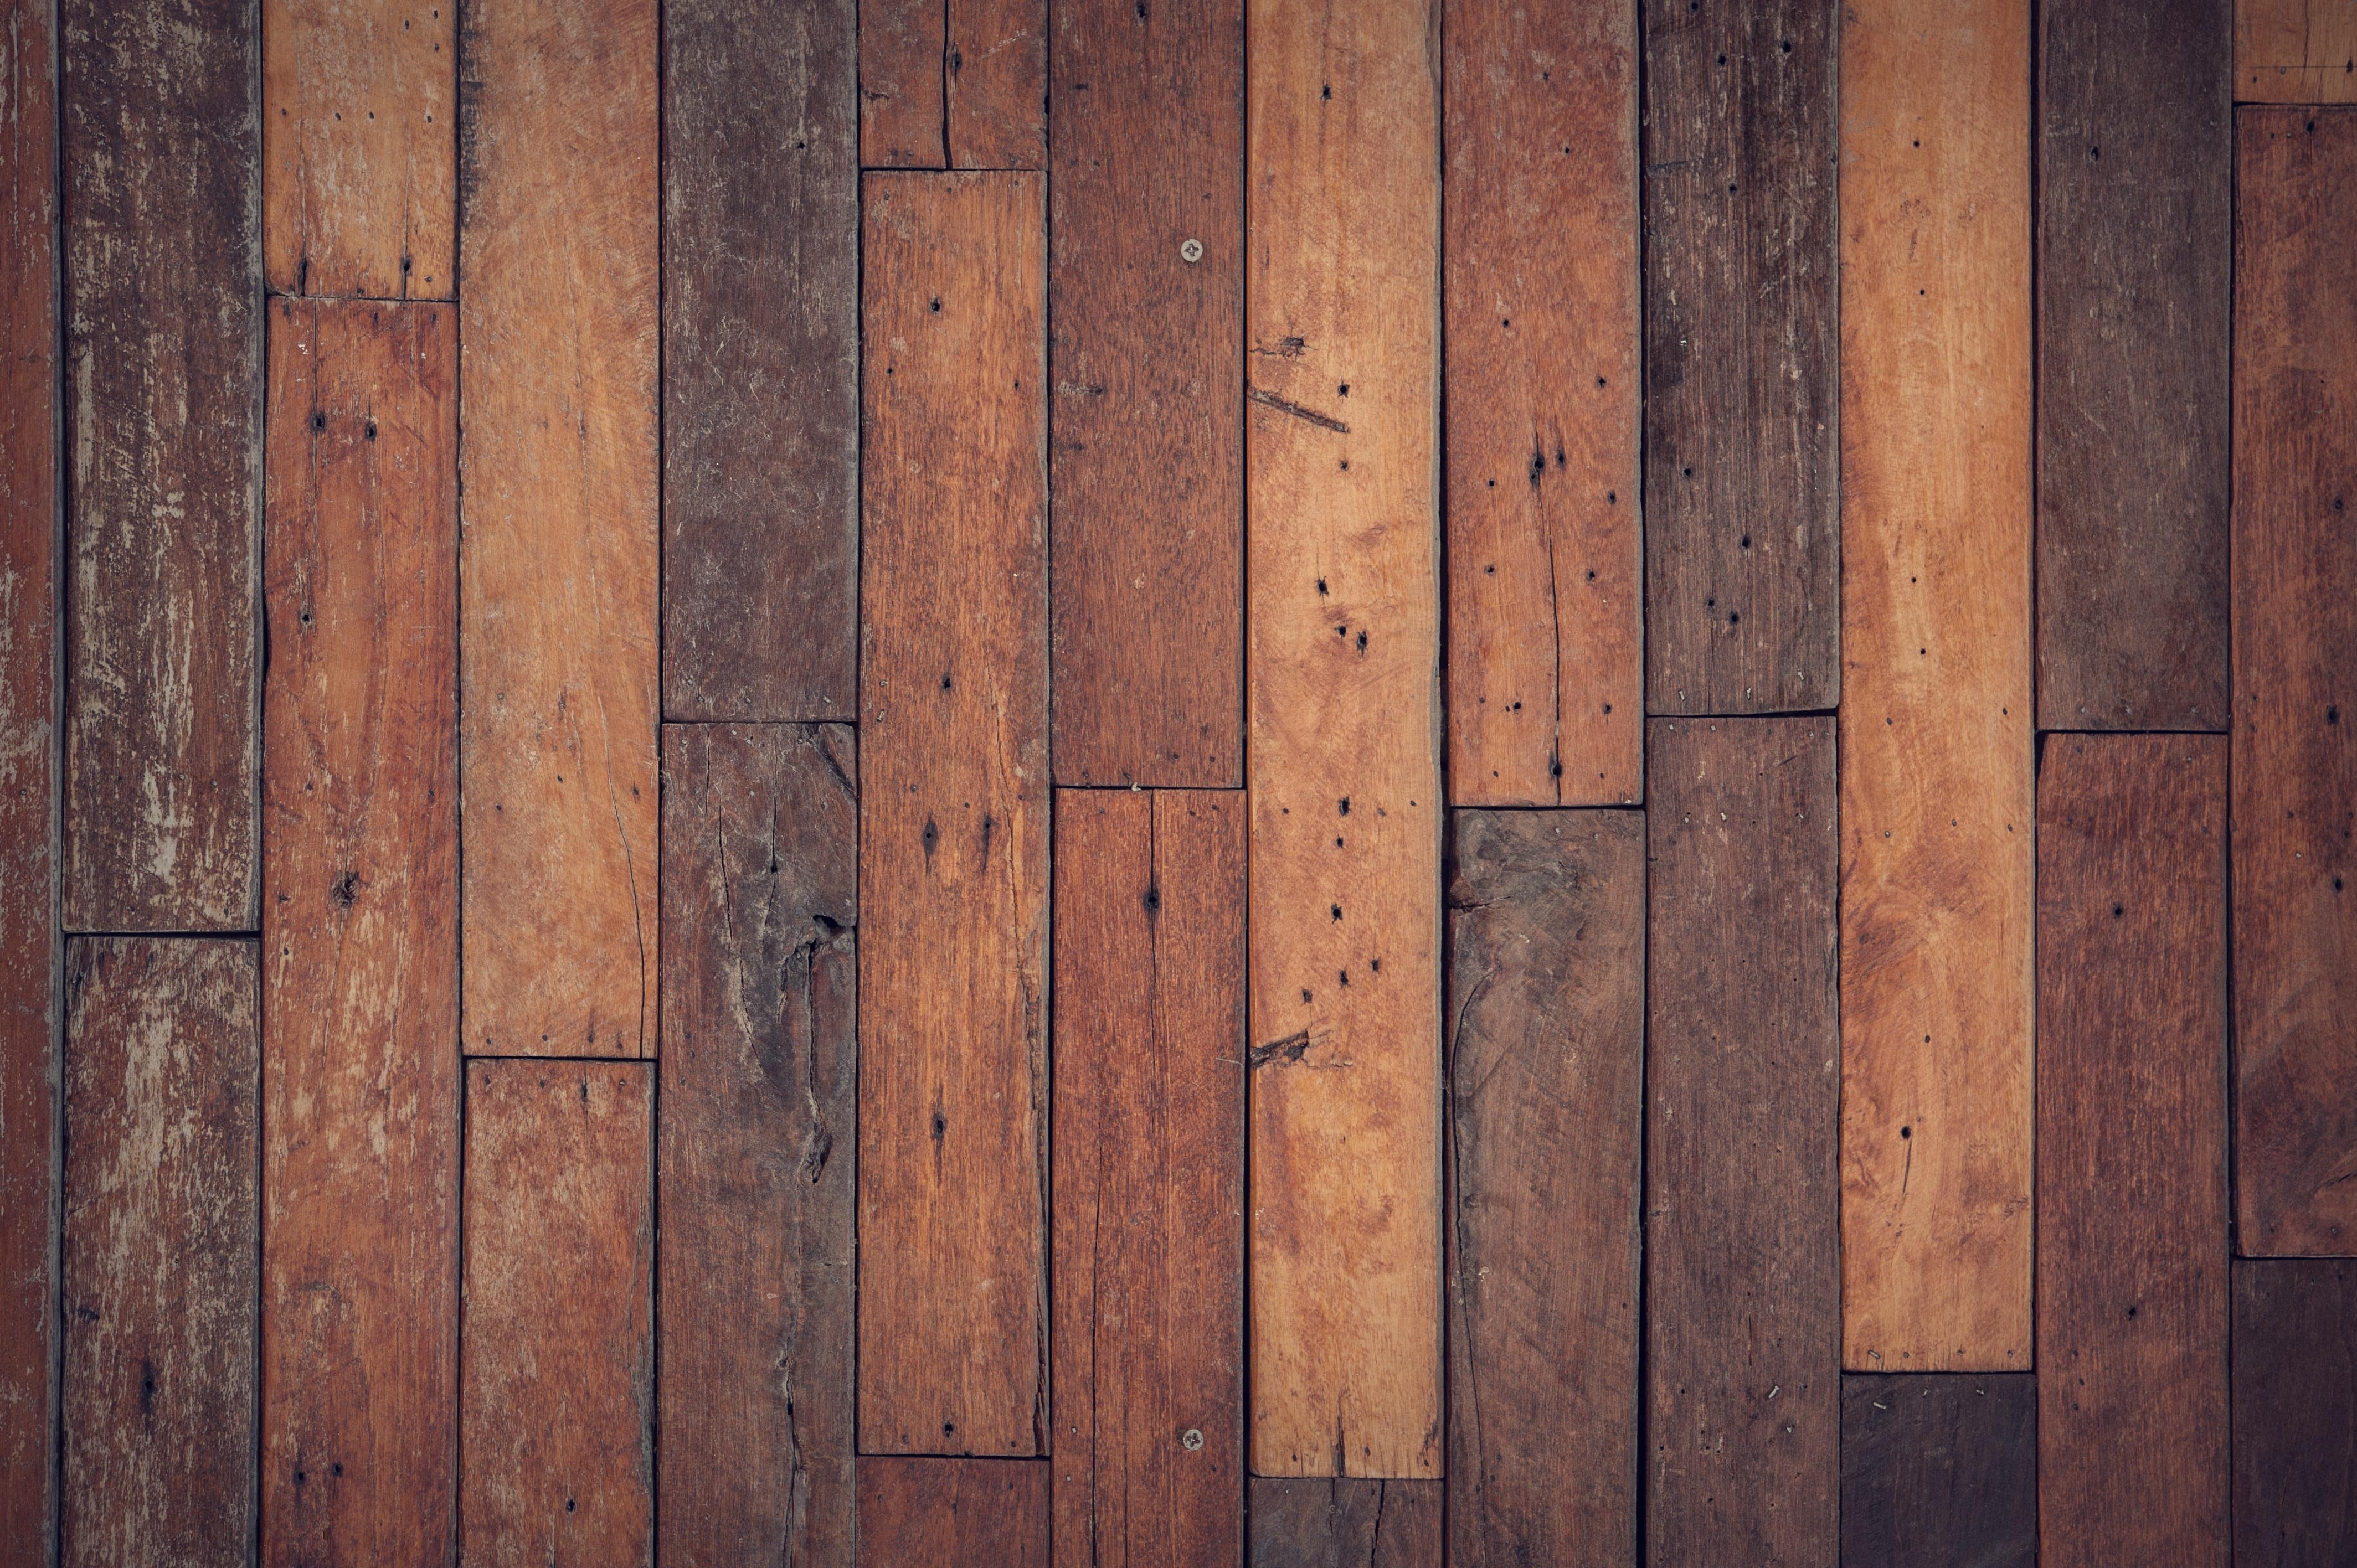 wooden texture dark pattern basketball floor brown pin wood